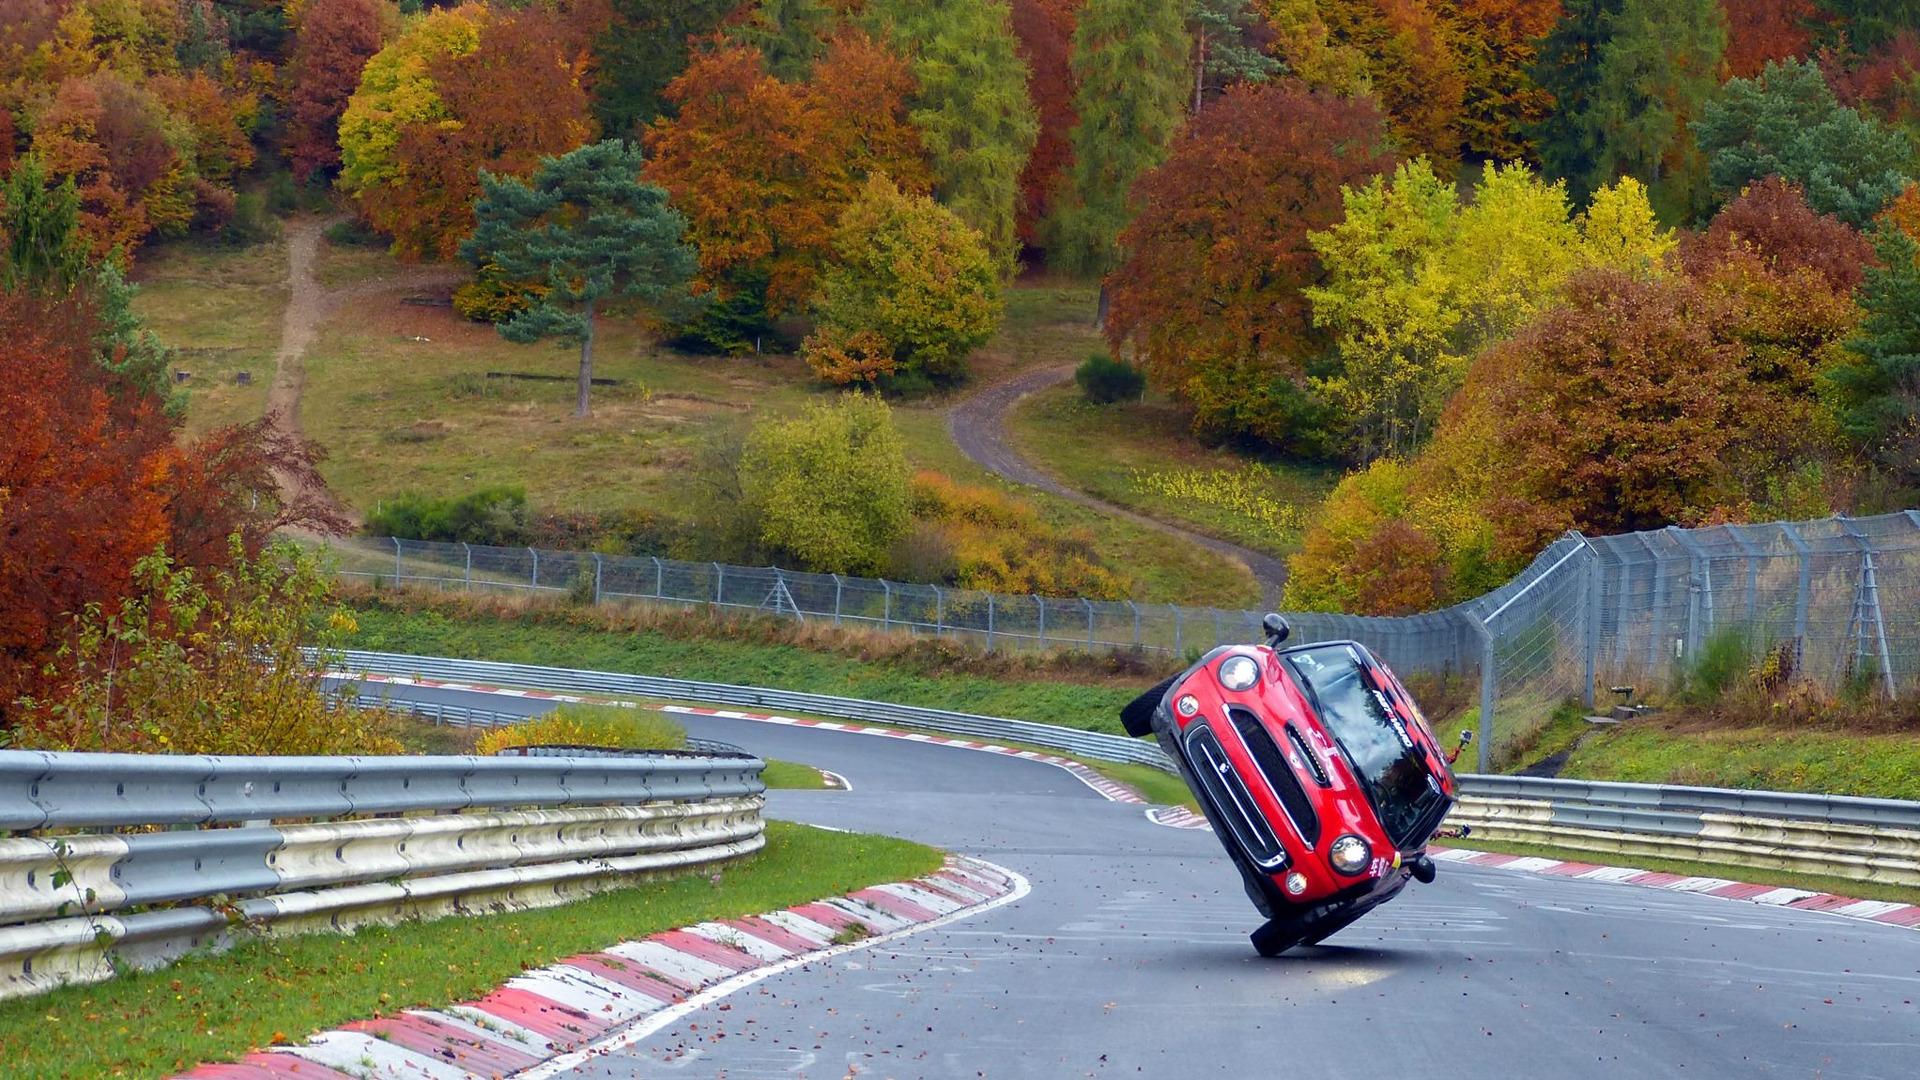 Stunt Wallpaper Hd Mini Laps The Nurburgring On Two Wheels